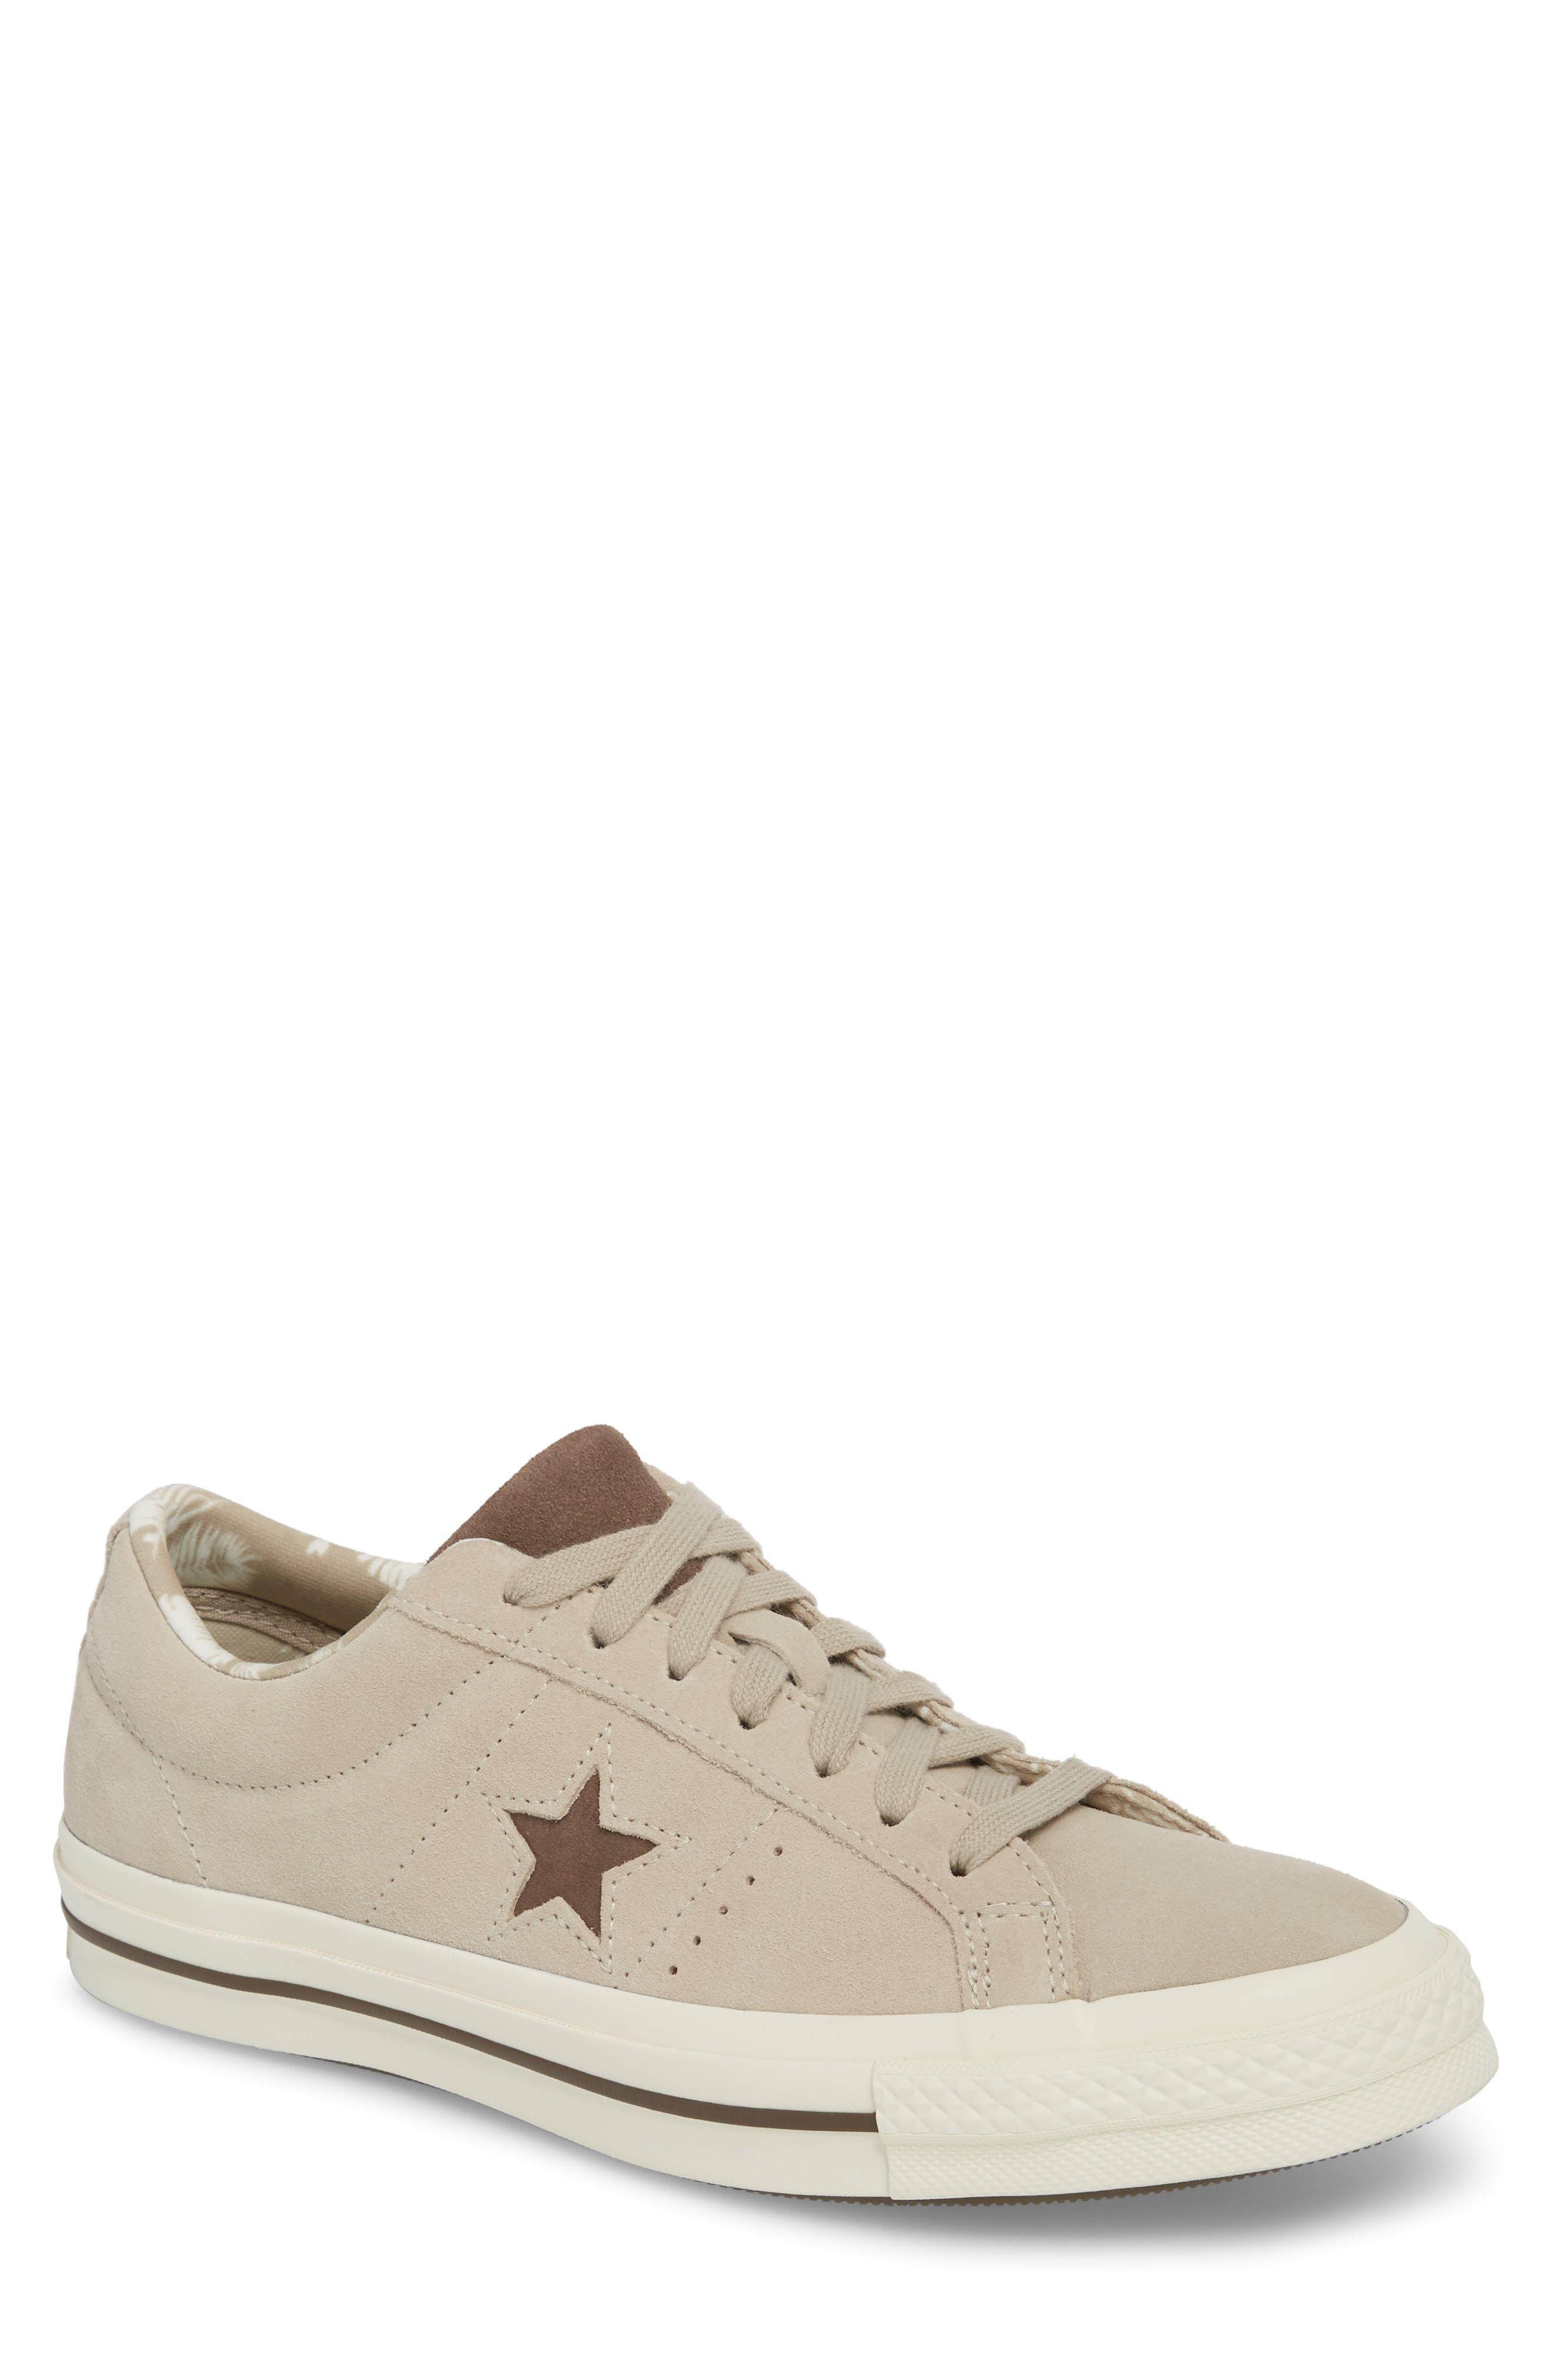 One-Star Tropical Sneaker,                             Main thumbnail 1, color,                             Khaki Suede